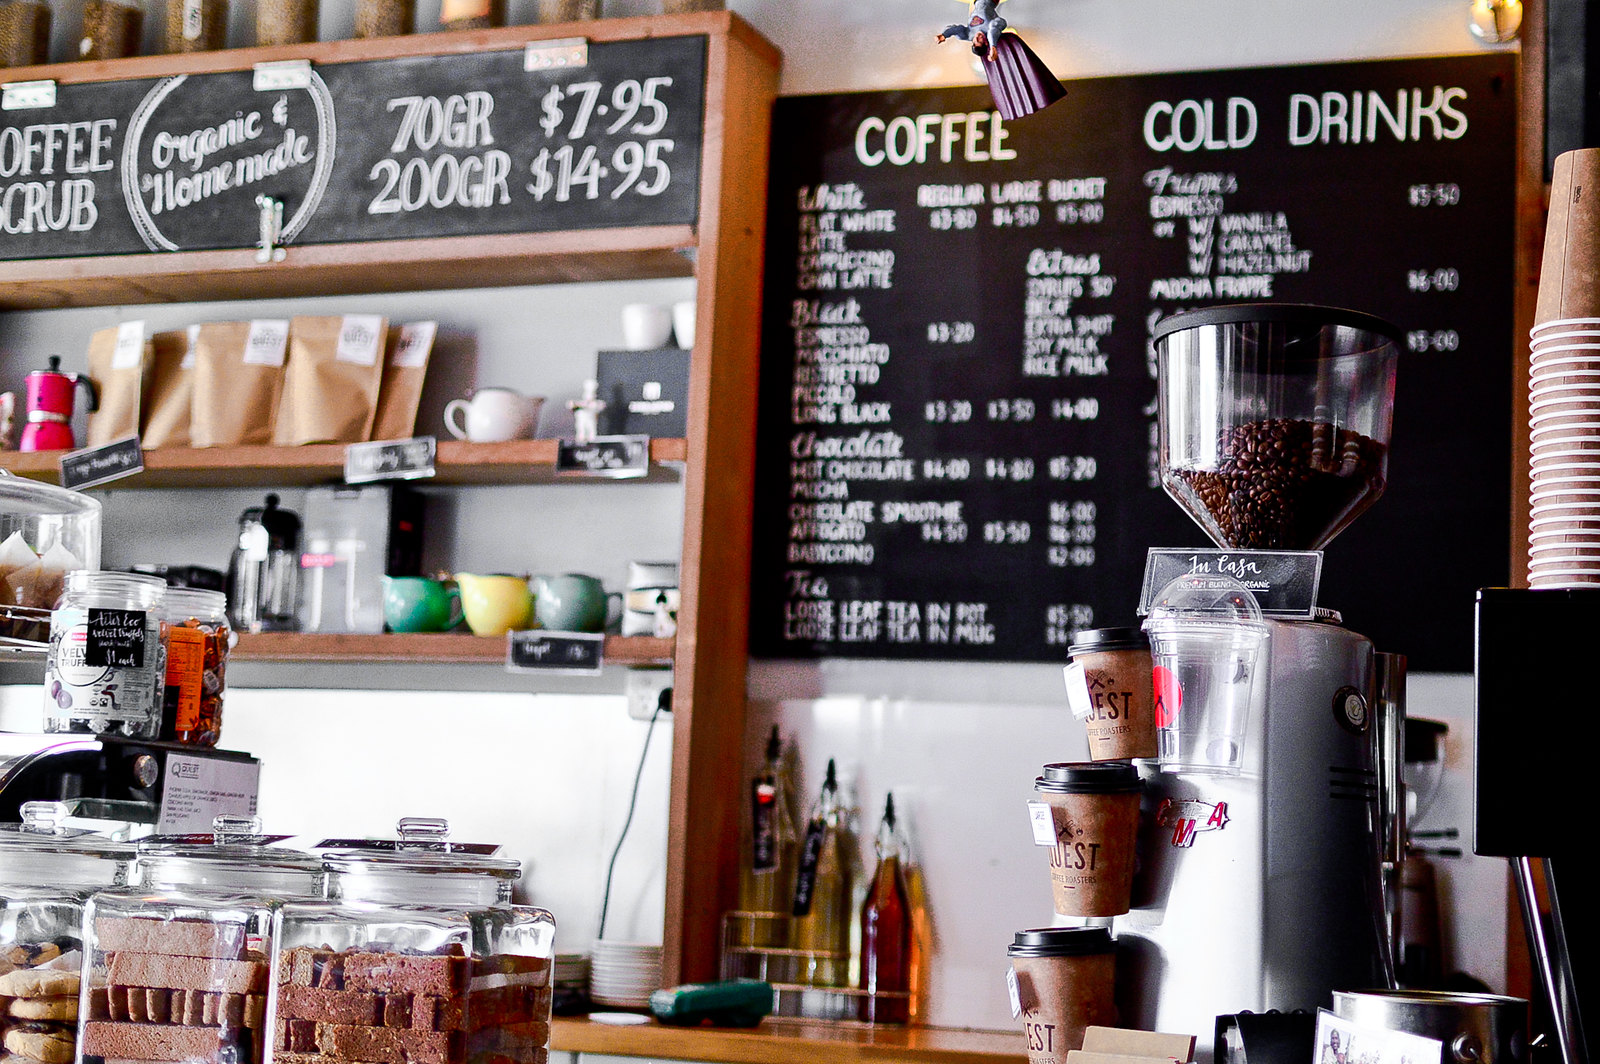 Burleigh Quest Coffee Roasters